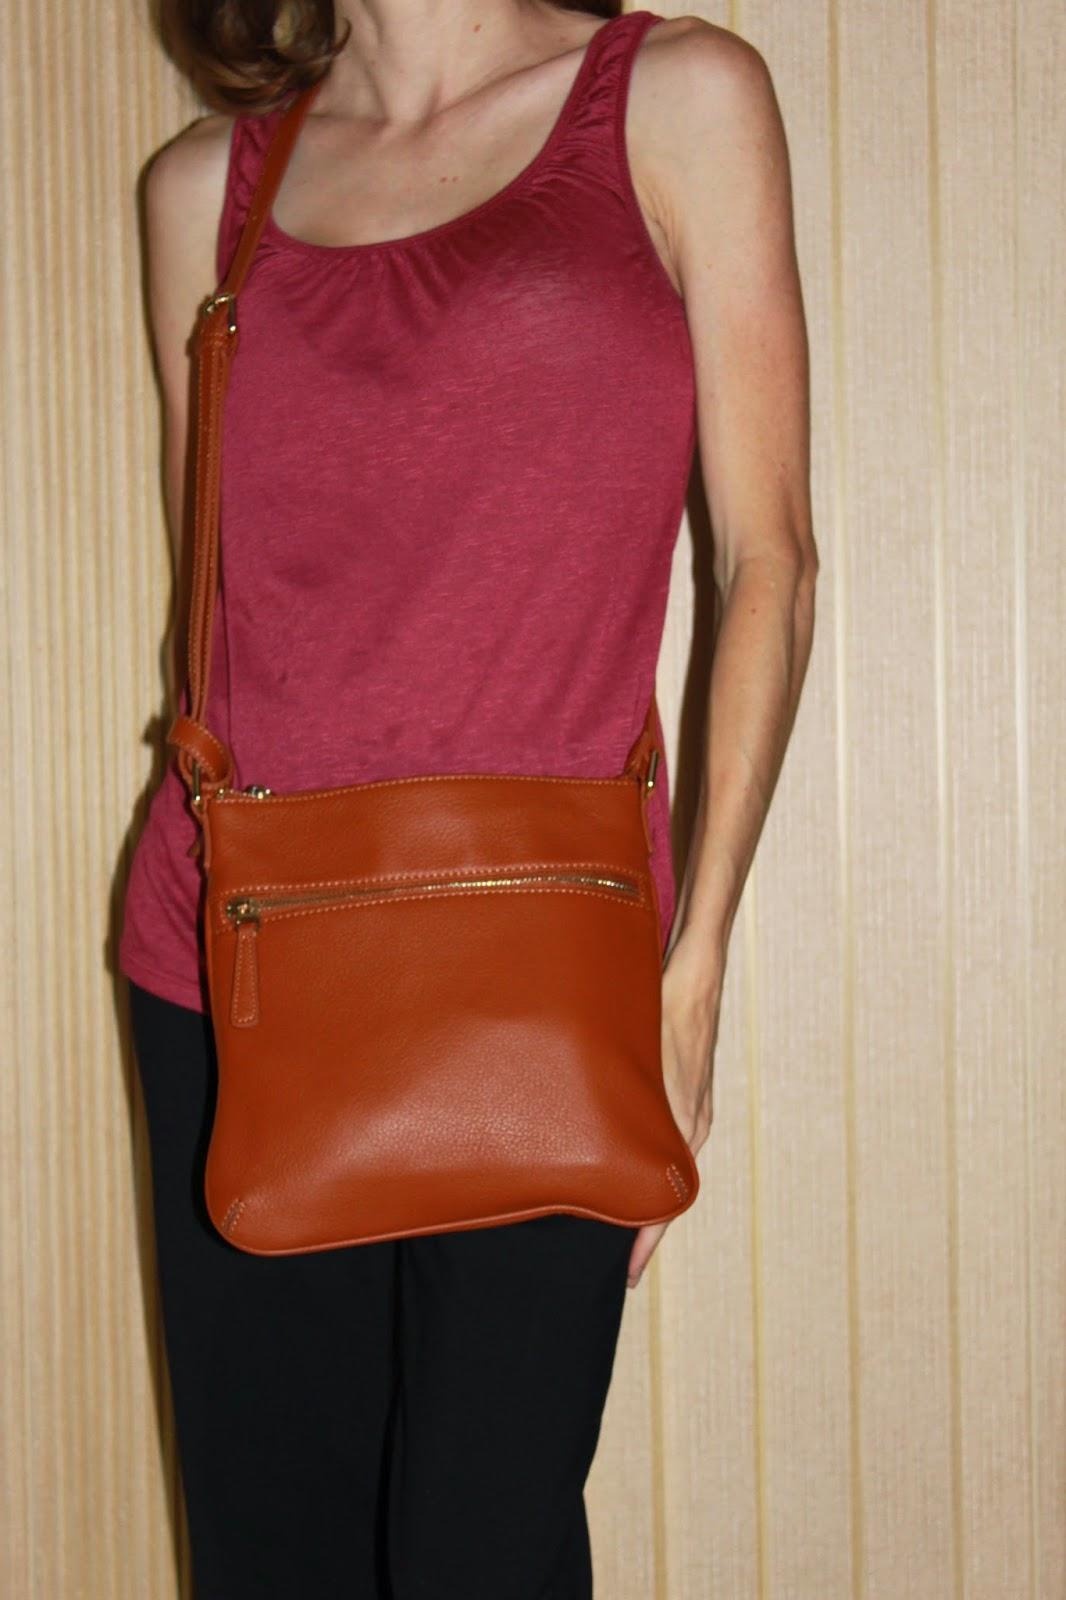 wearing SUSU Saxon Crossbody Handbag #review #ivysvariety